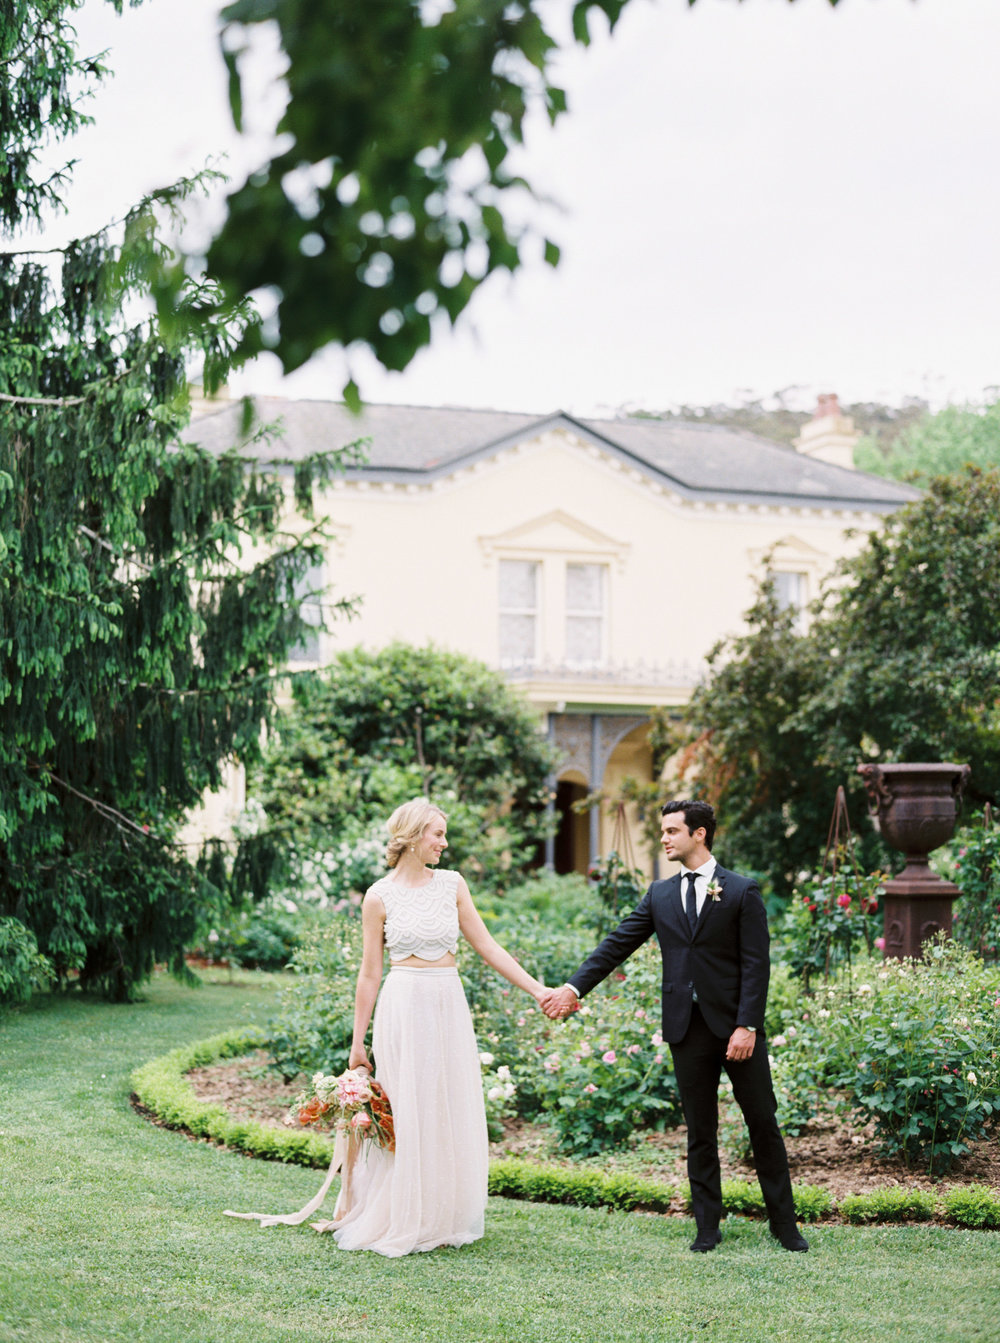 Timeless Southern Highland Wedding Elopement in Bowral NSW Fine Art Film Photographer Sheri McMahon-35.jpg